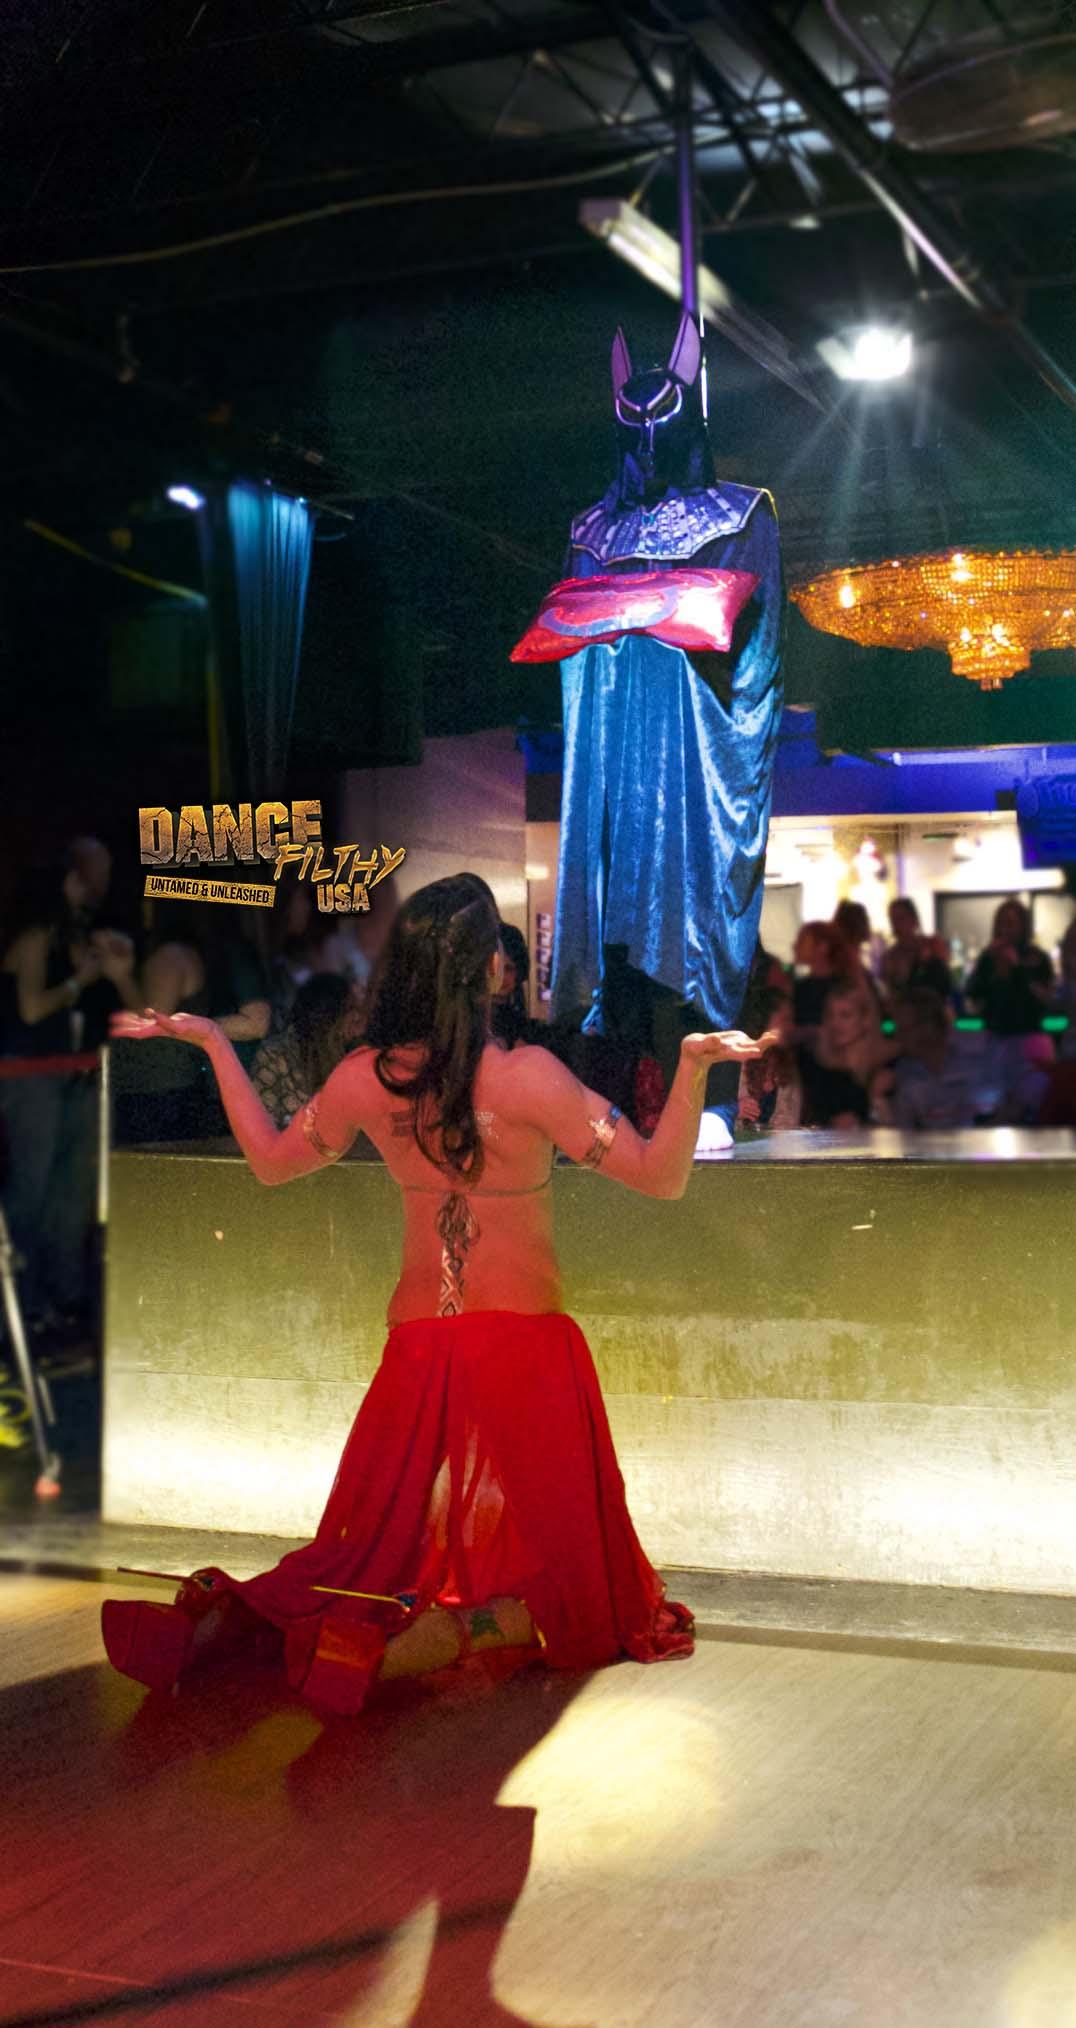 Dance Filthy USA K. G. Money $$